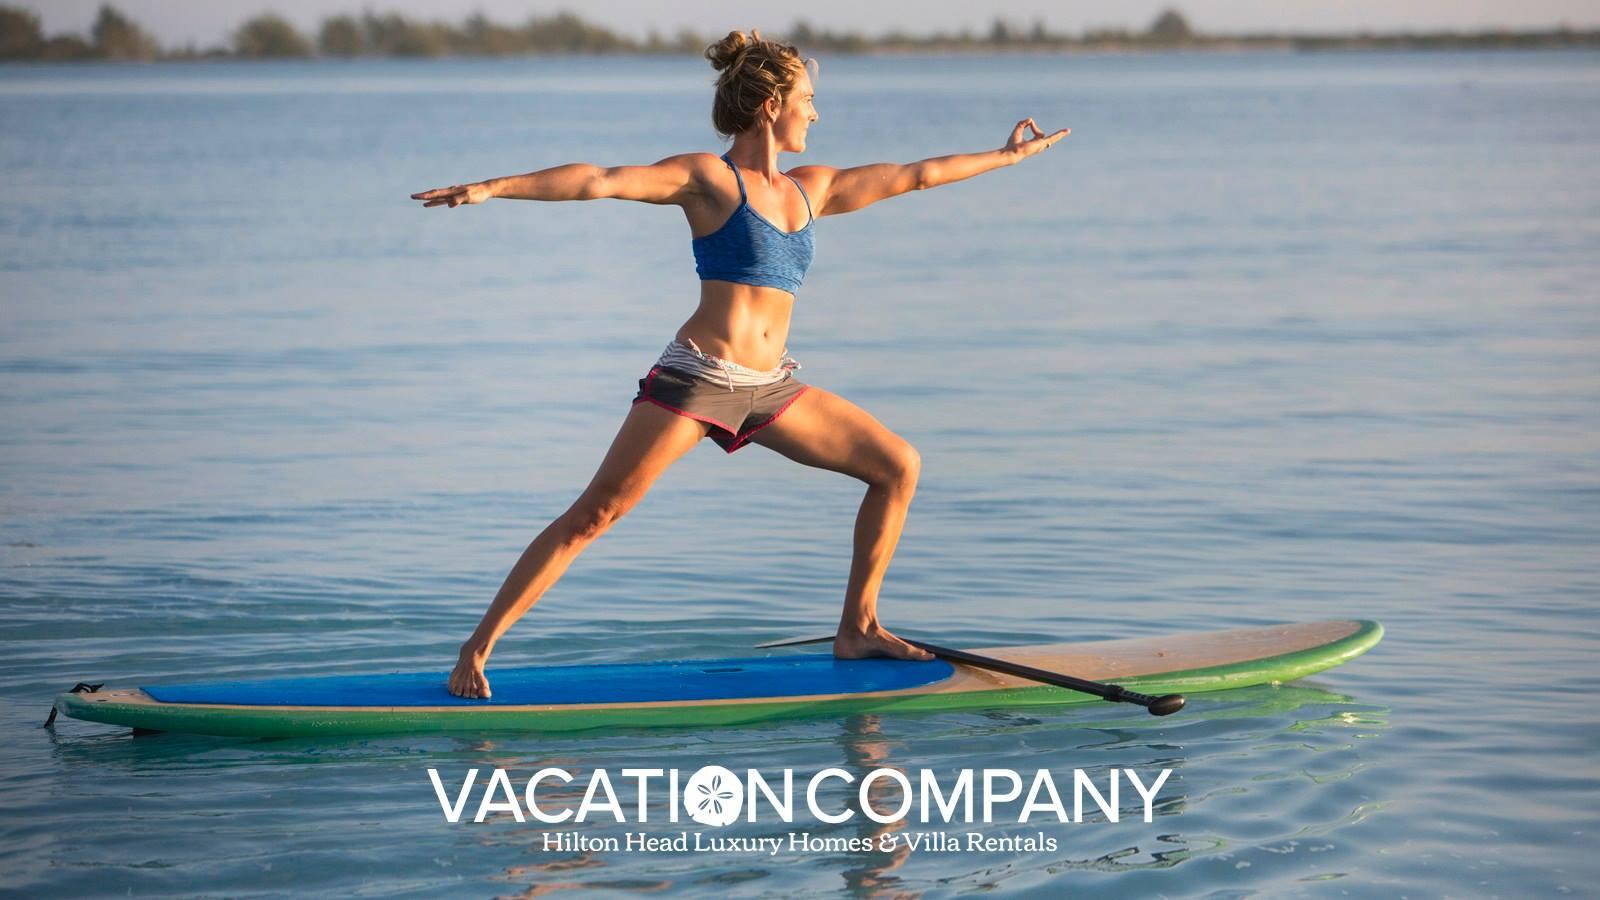 Hilton Head Island Mother's Day The Vacation Company